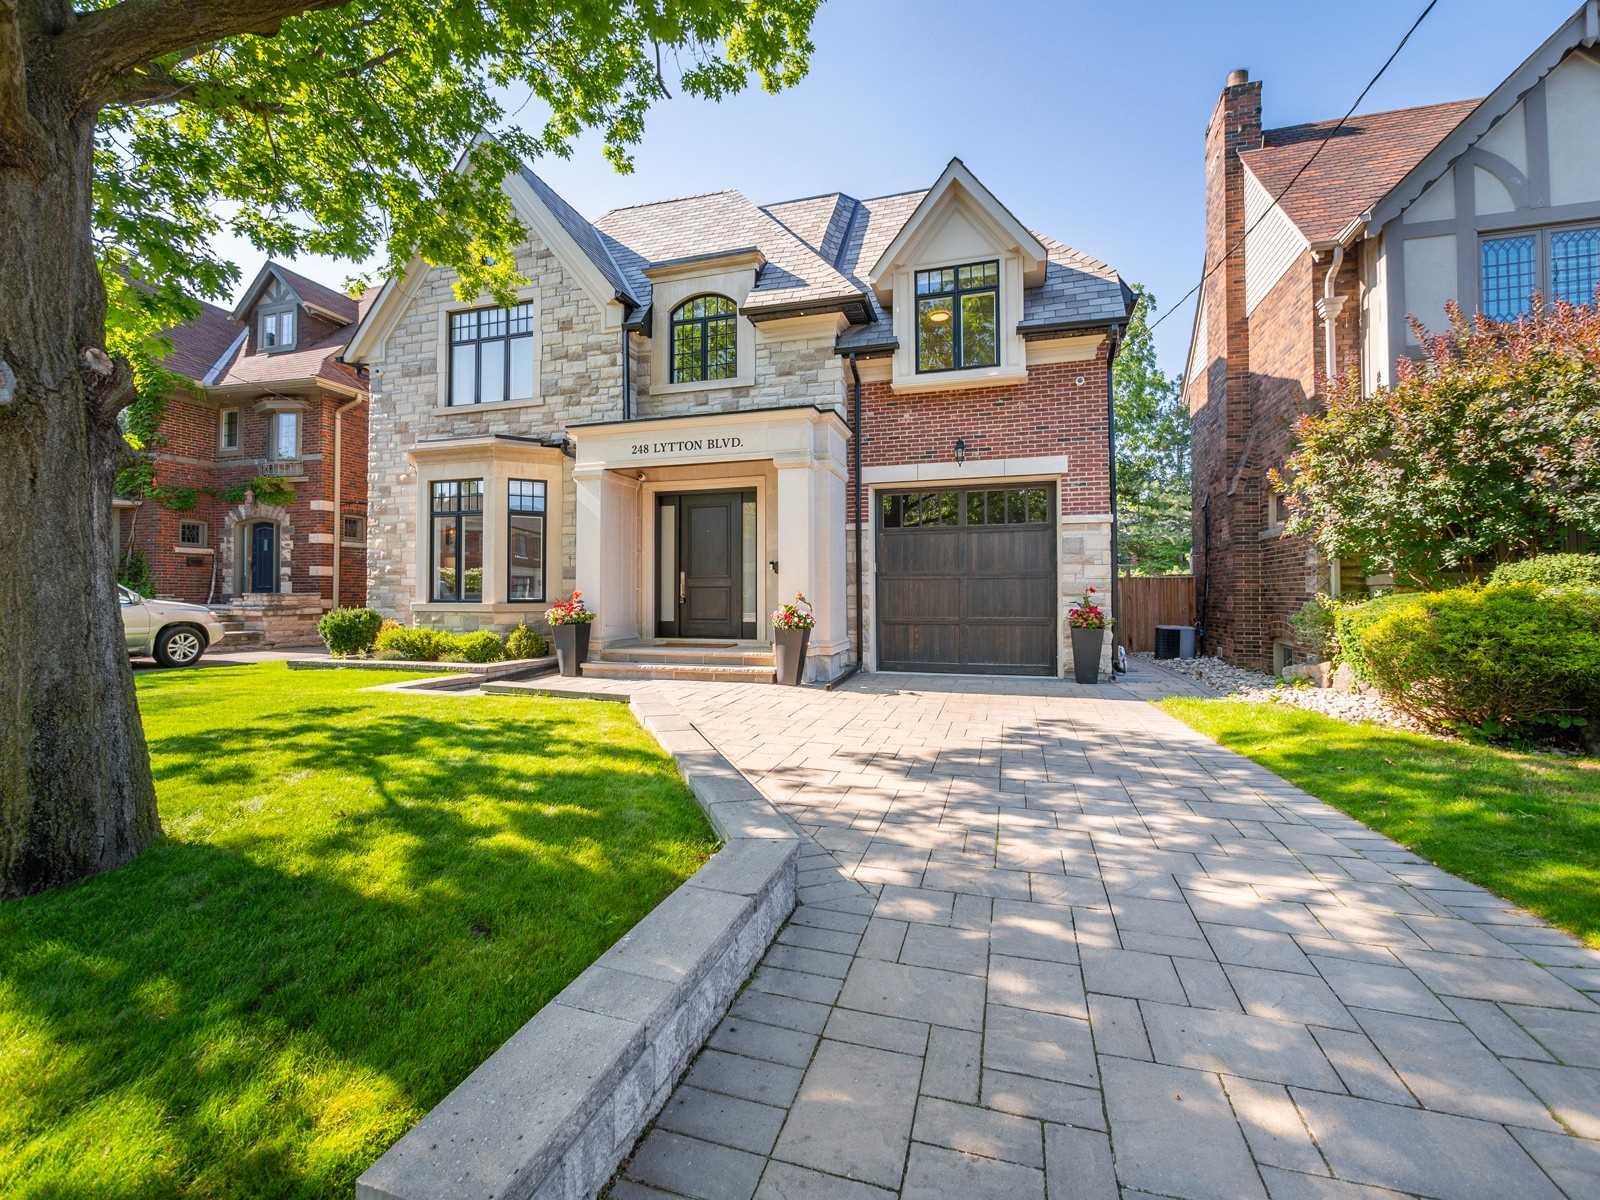 248 Lytton Blvd, Toronto, M5N1R6